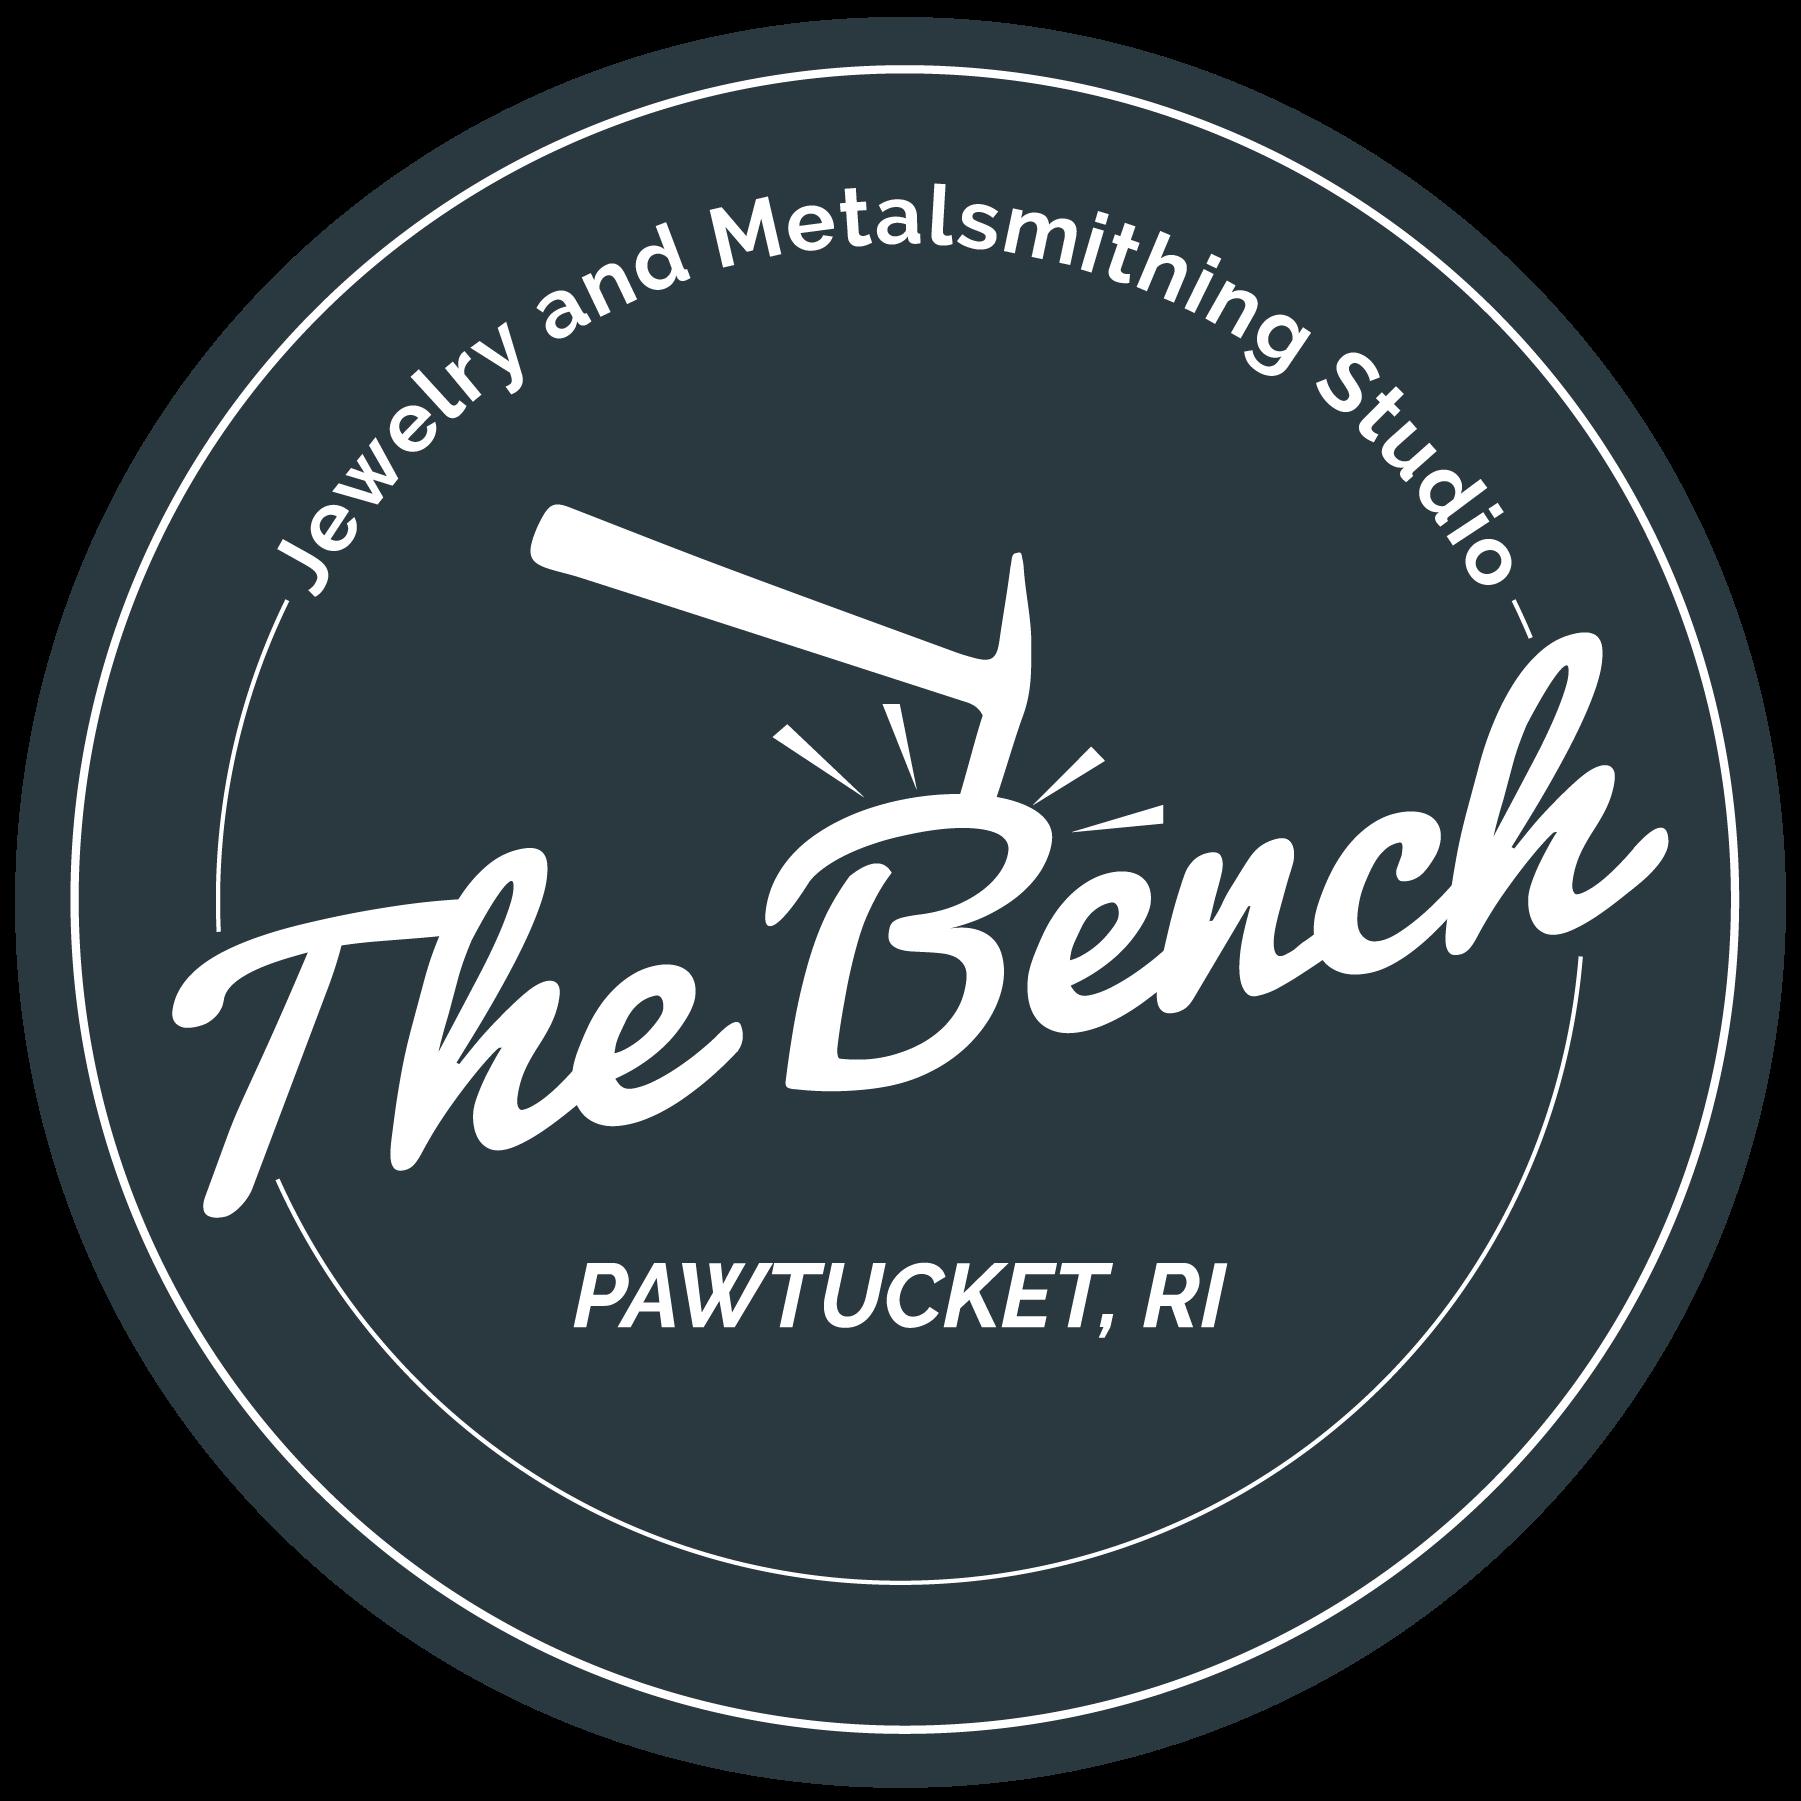 The Bench RI